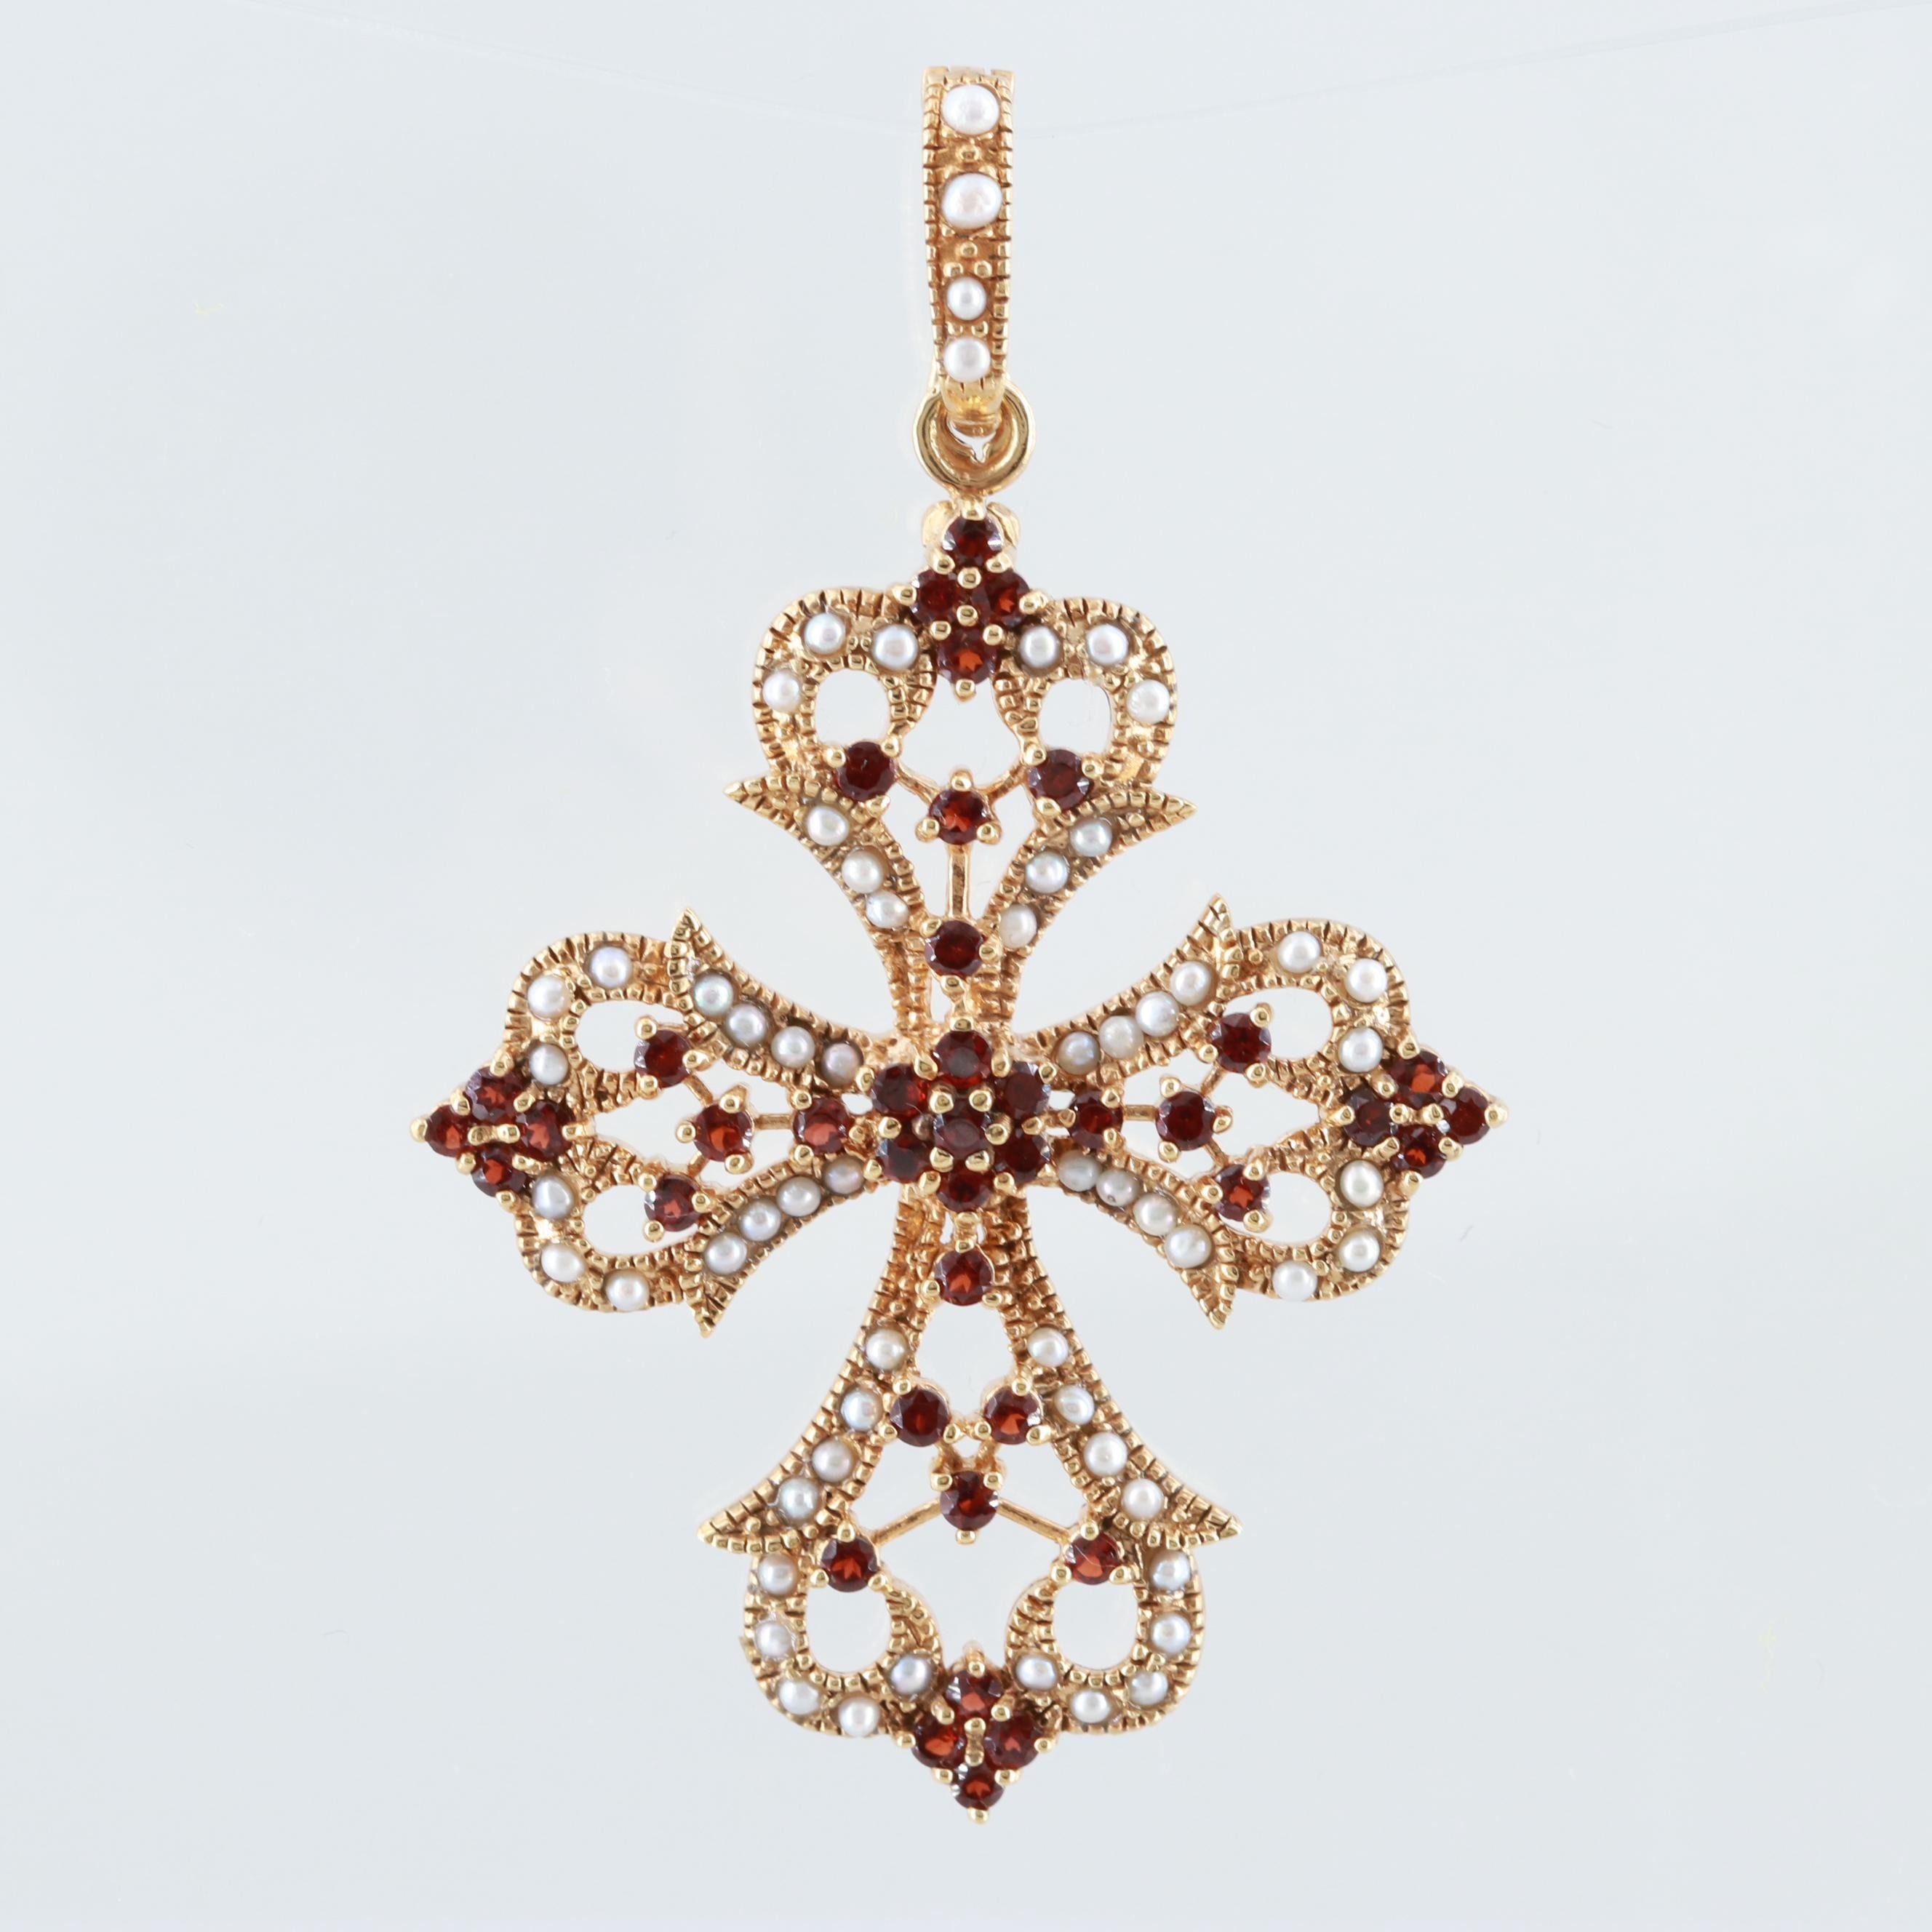 Gold Wash on Sterling Silver Garnet and Cultured Pearl Cross Enhancer Pendant